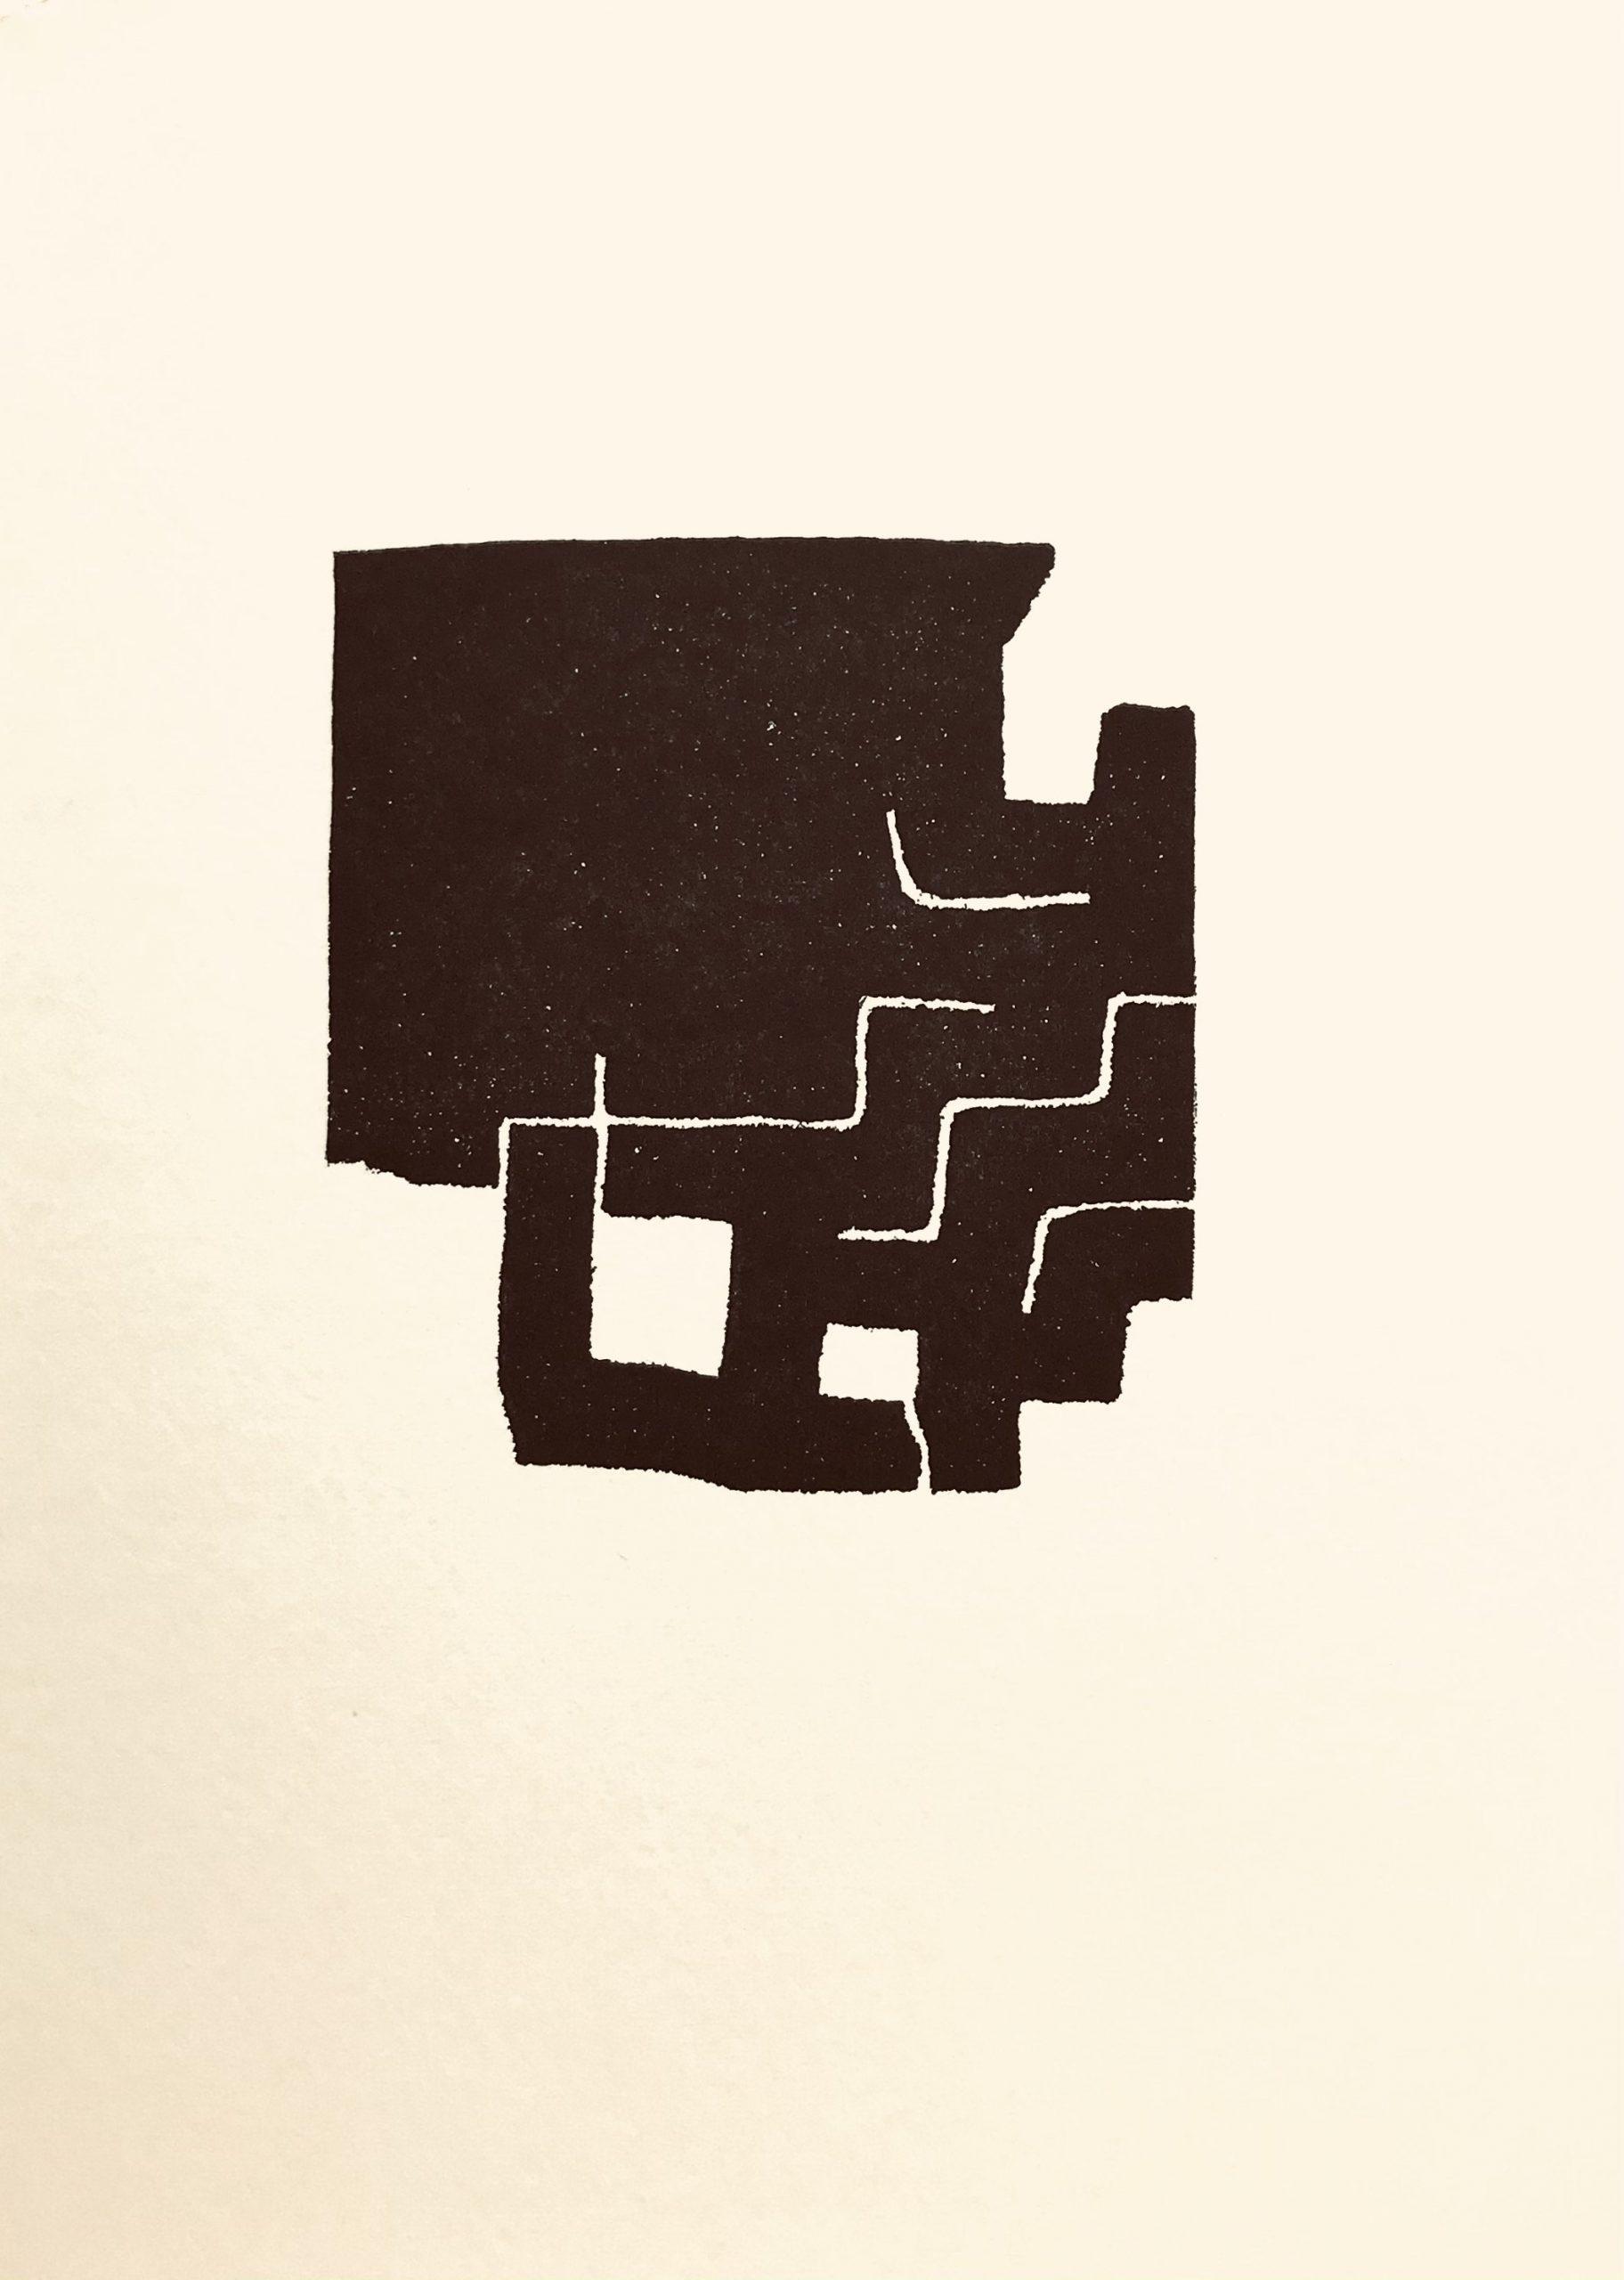 Eduardo Chillida Lithograph 3, Maeght Editeur 1975